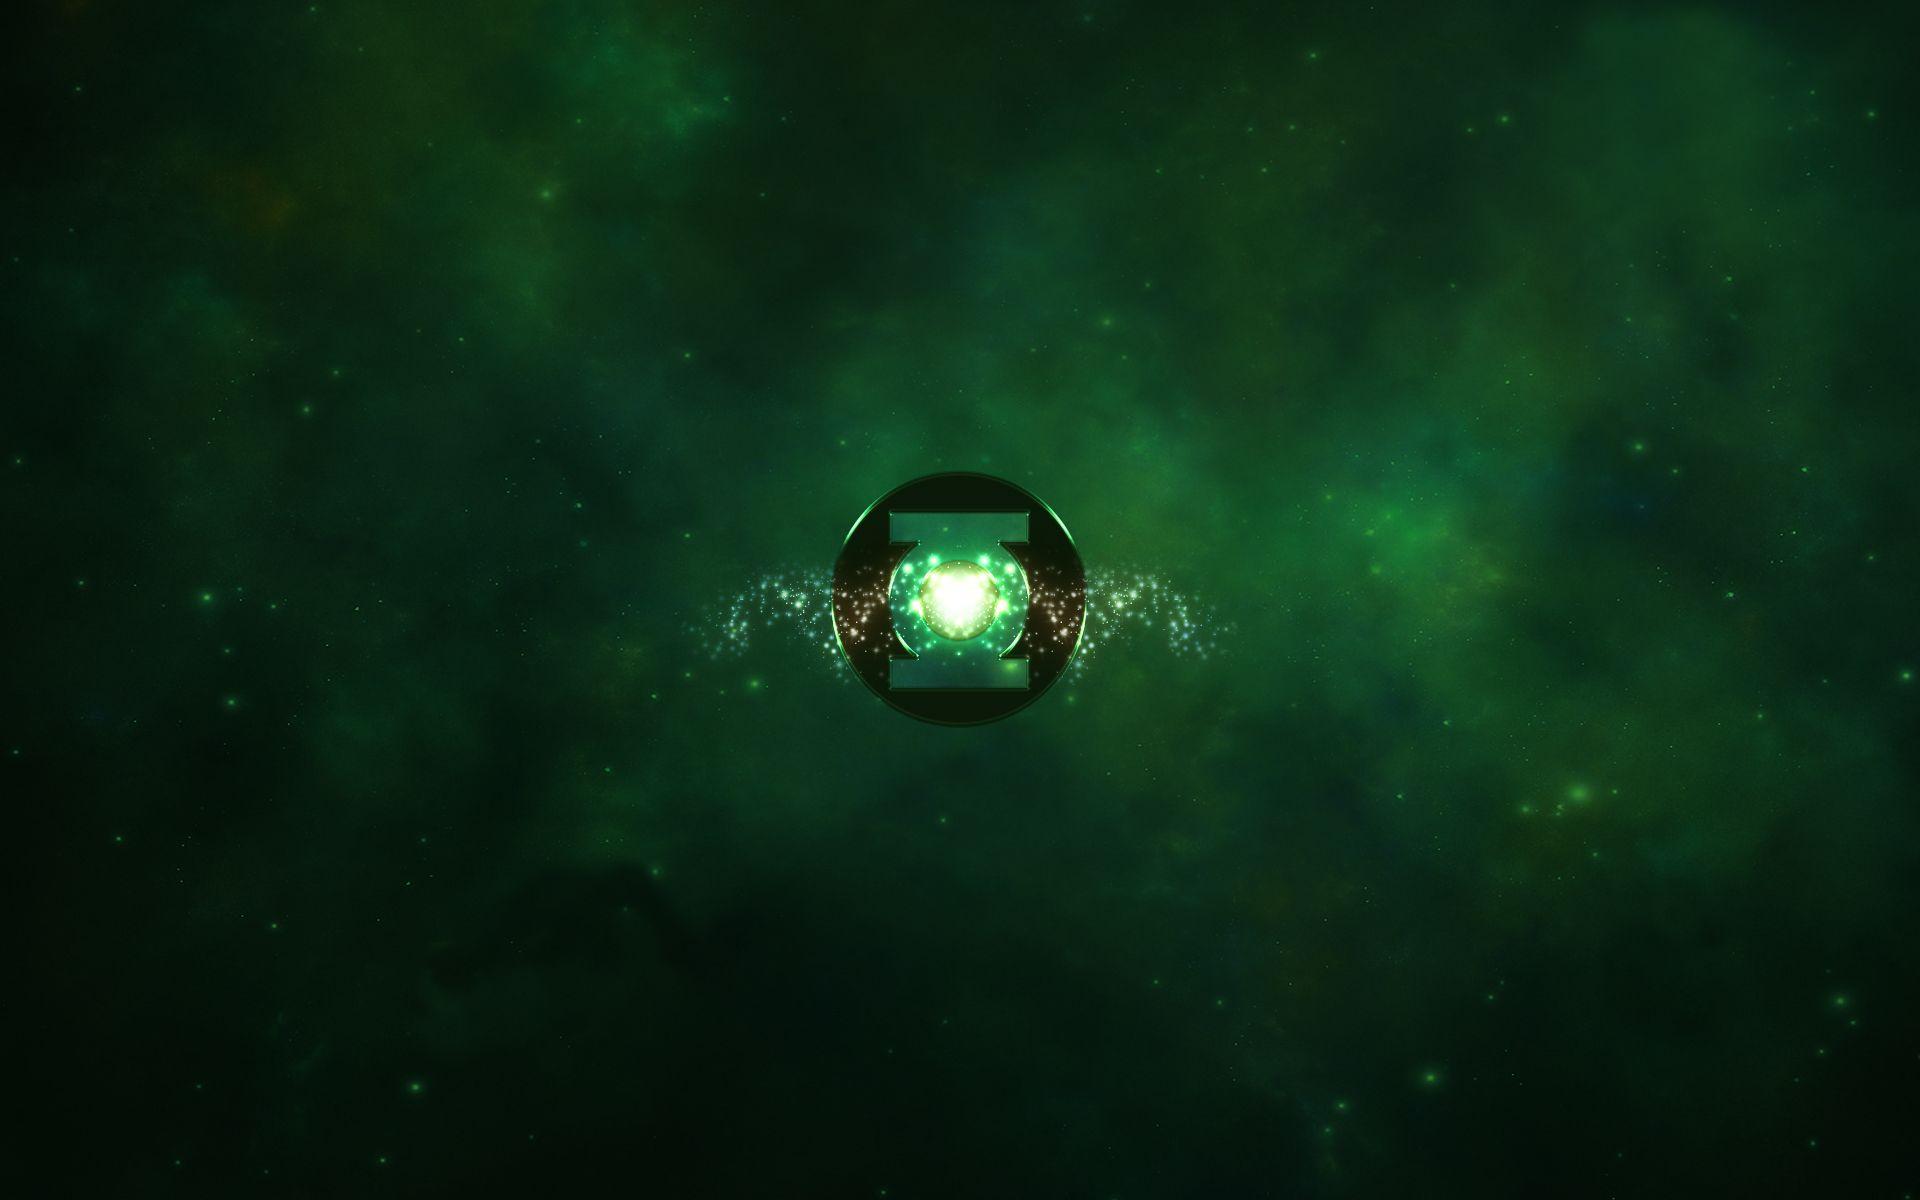 green lantern artwork wallpaper - photo #33